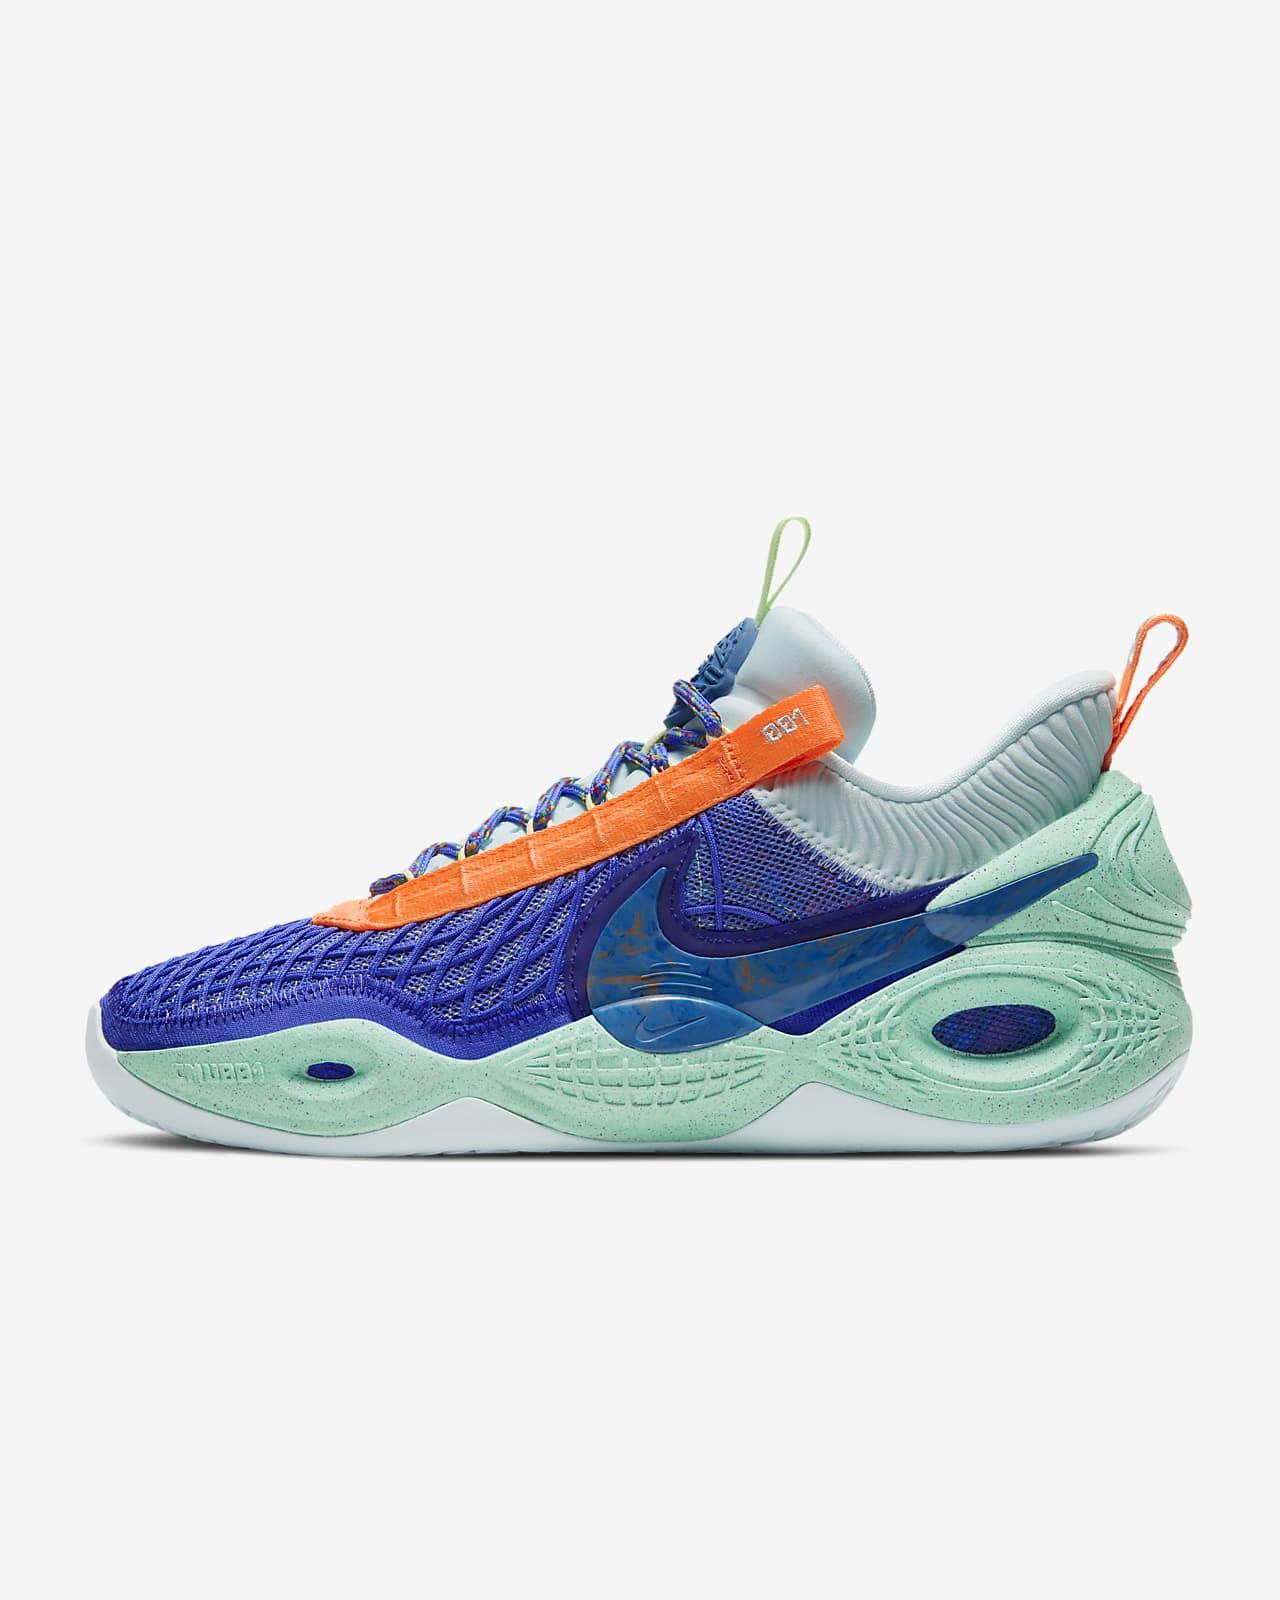 Chaussure de basketball Nike Cosmic Unity «Amalgam»